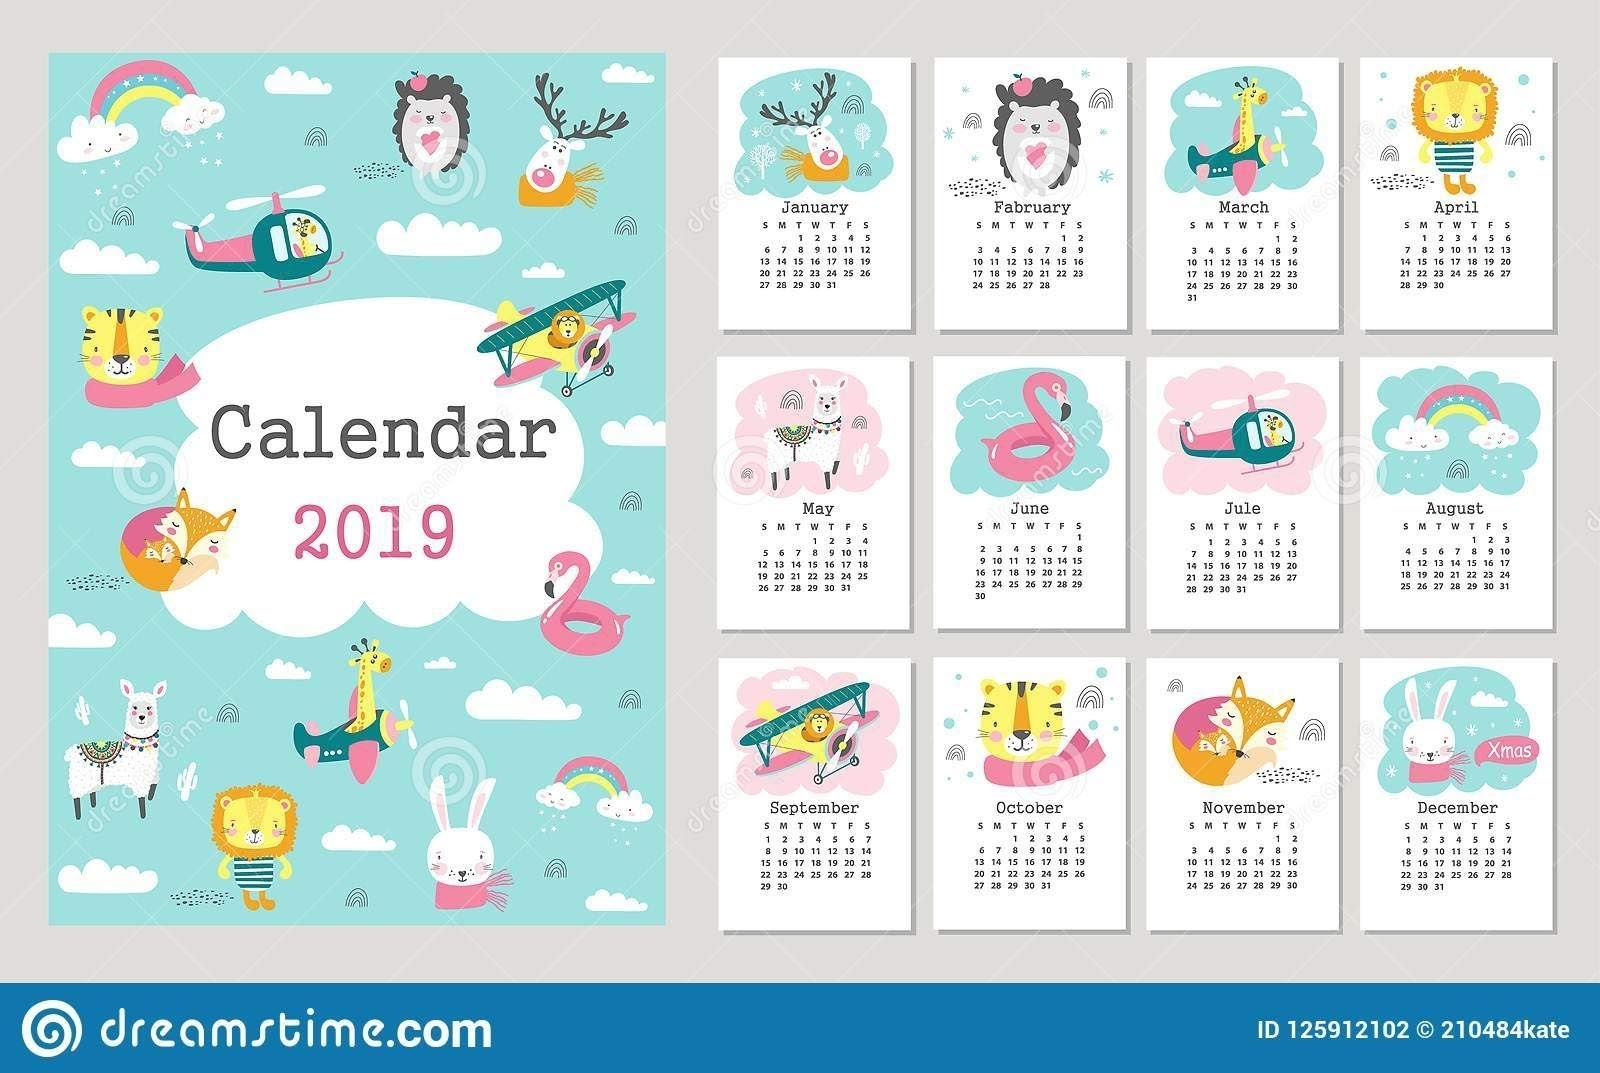 Calendar Printables Design Calendar Ideas Diy Printable Calendar regarding Free Printable Advent Calendars Wallpaper